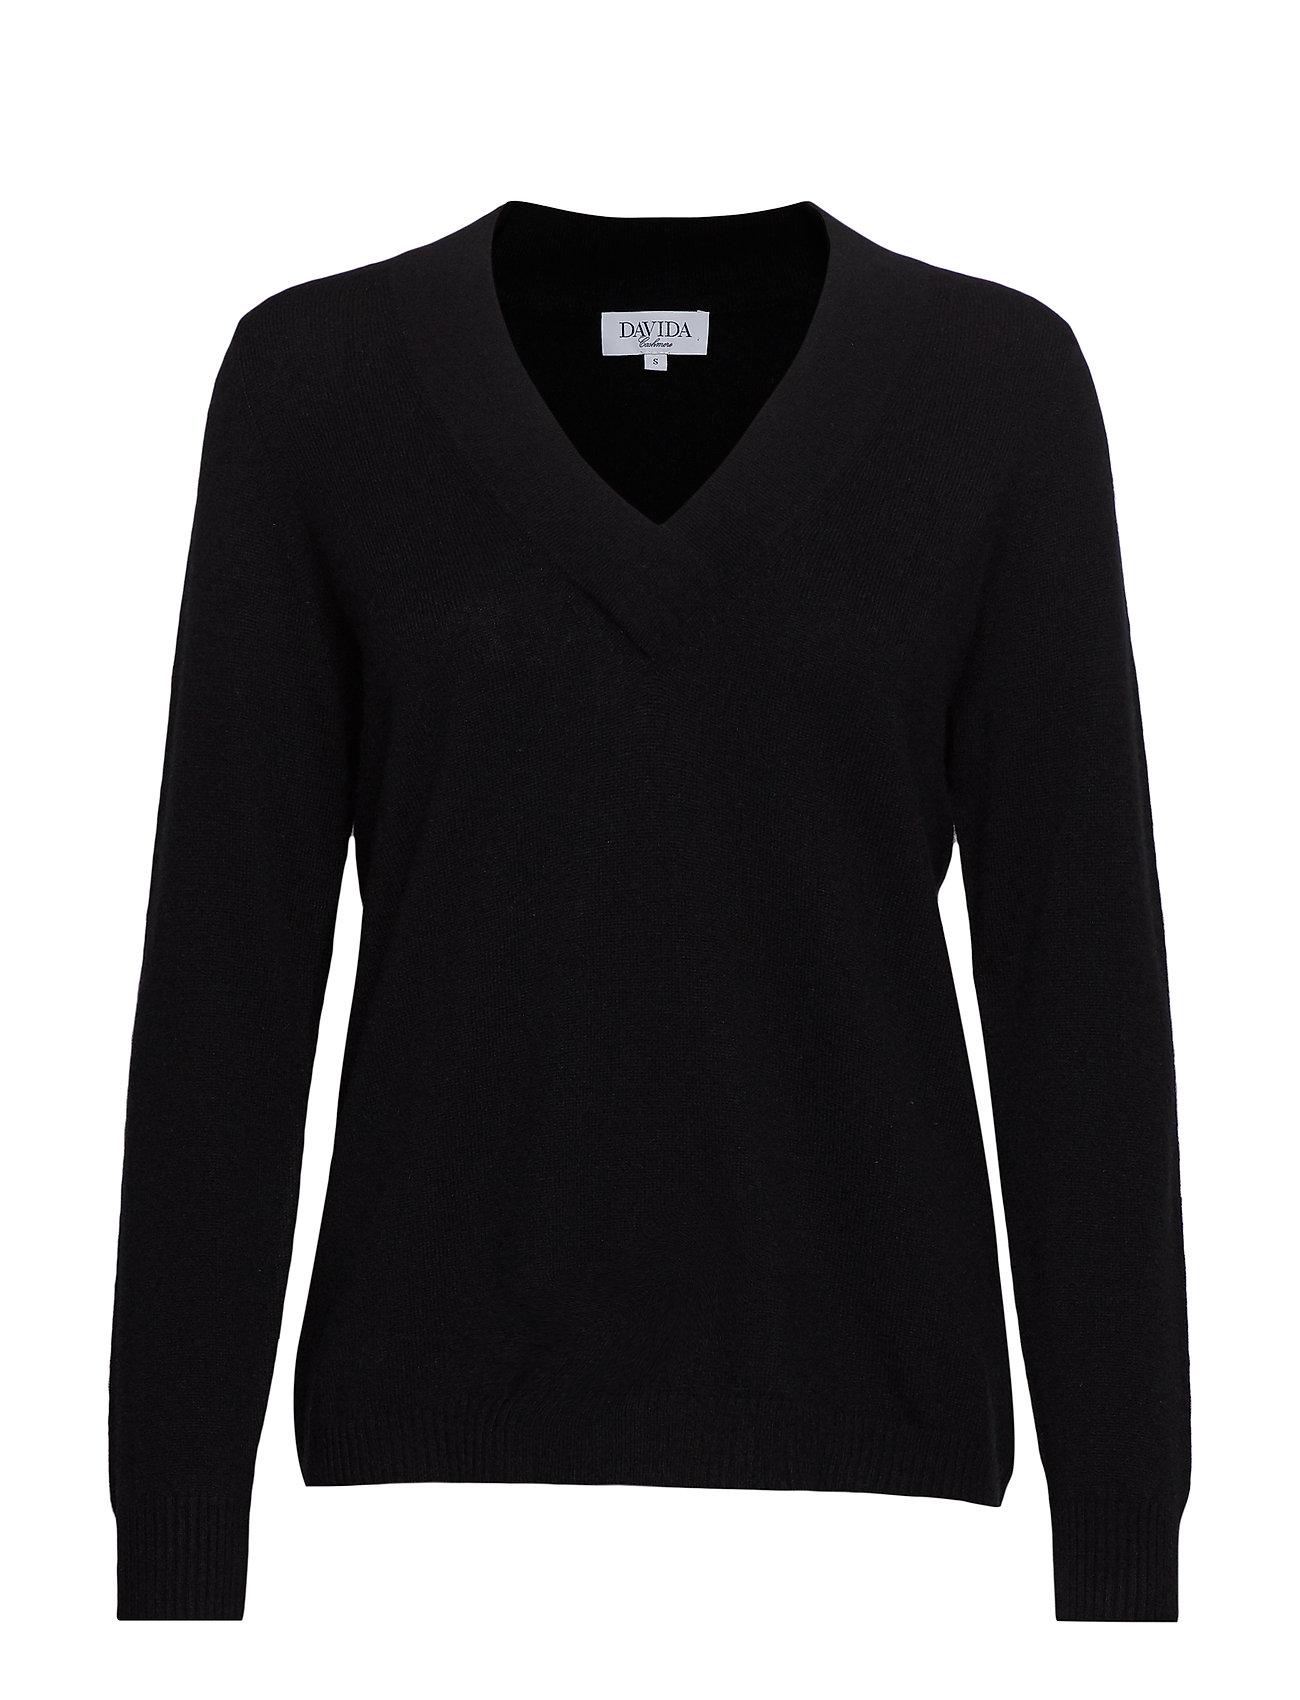 Davida Cashmere V-neck oversized sweater - BLACK